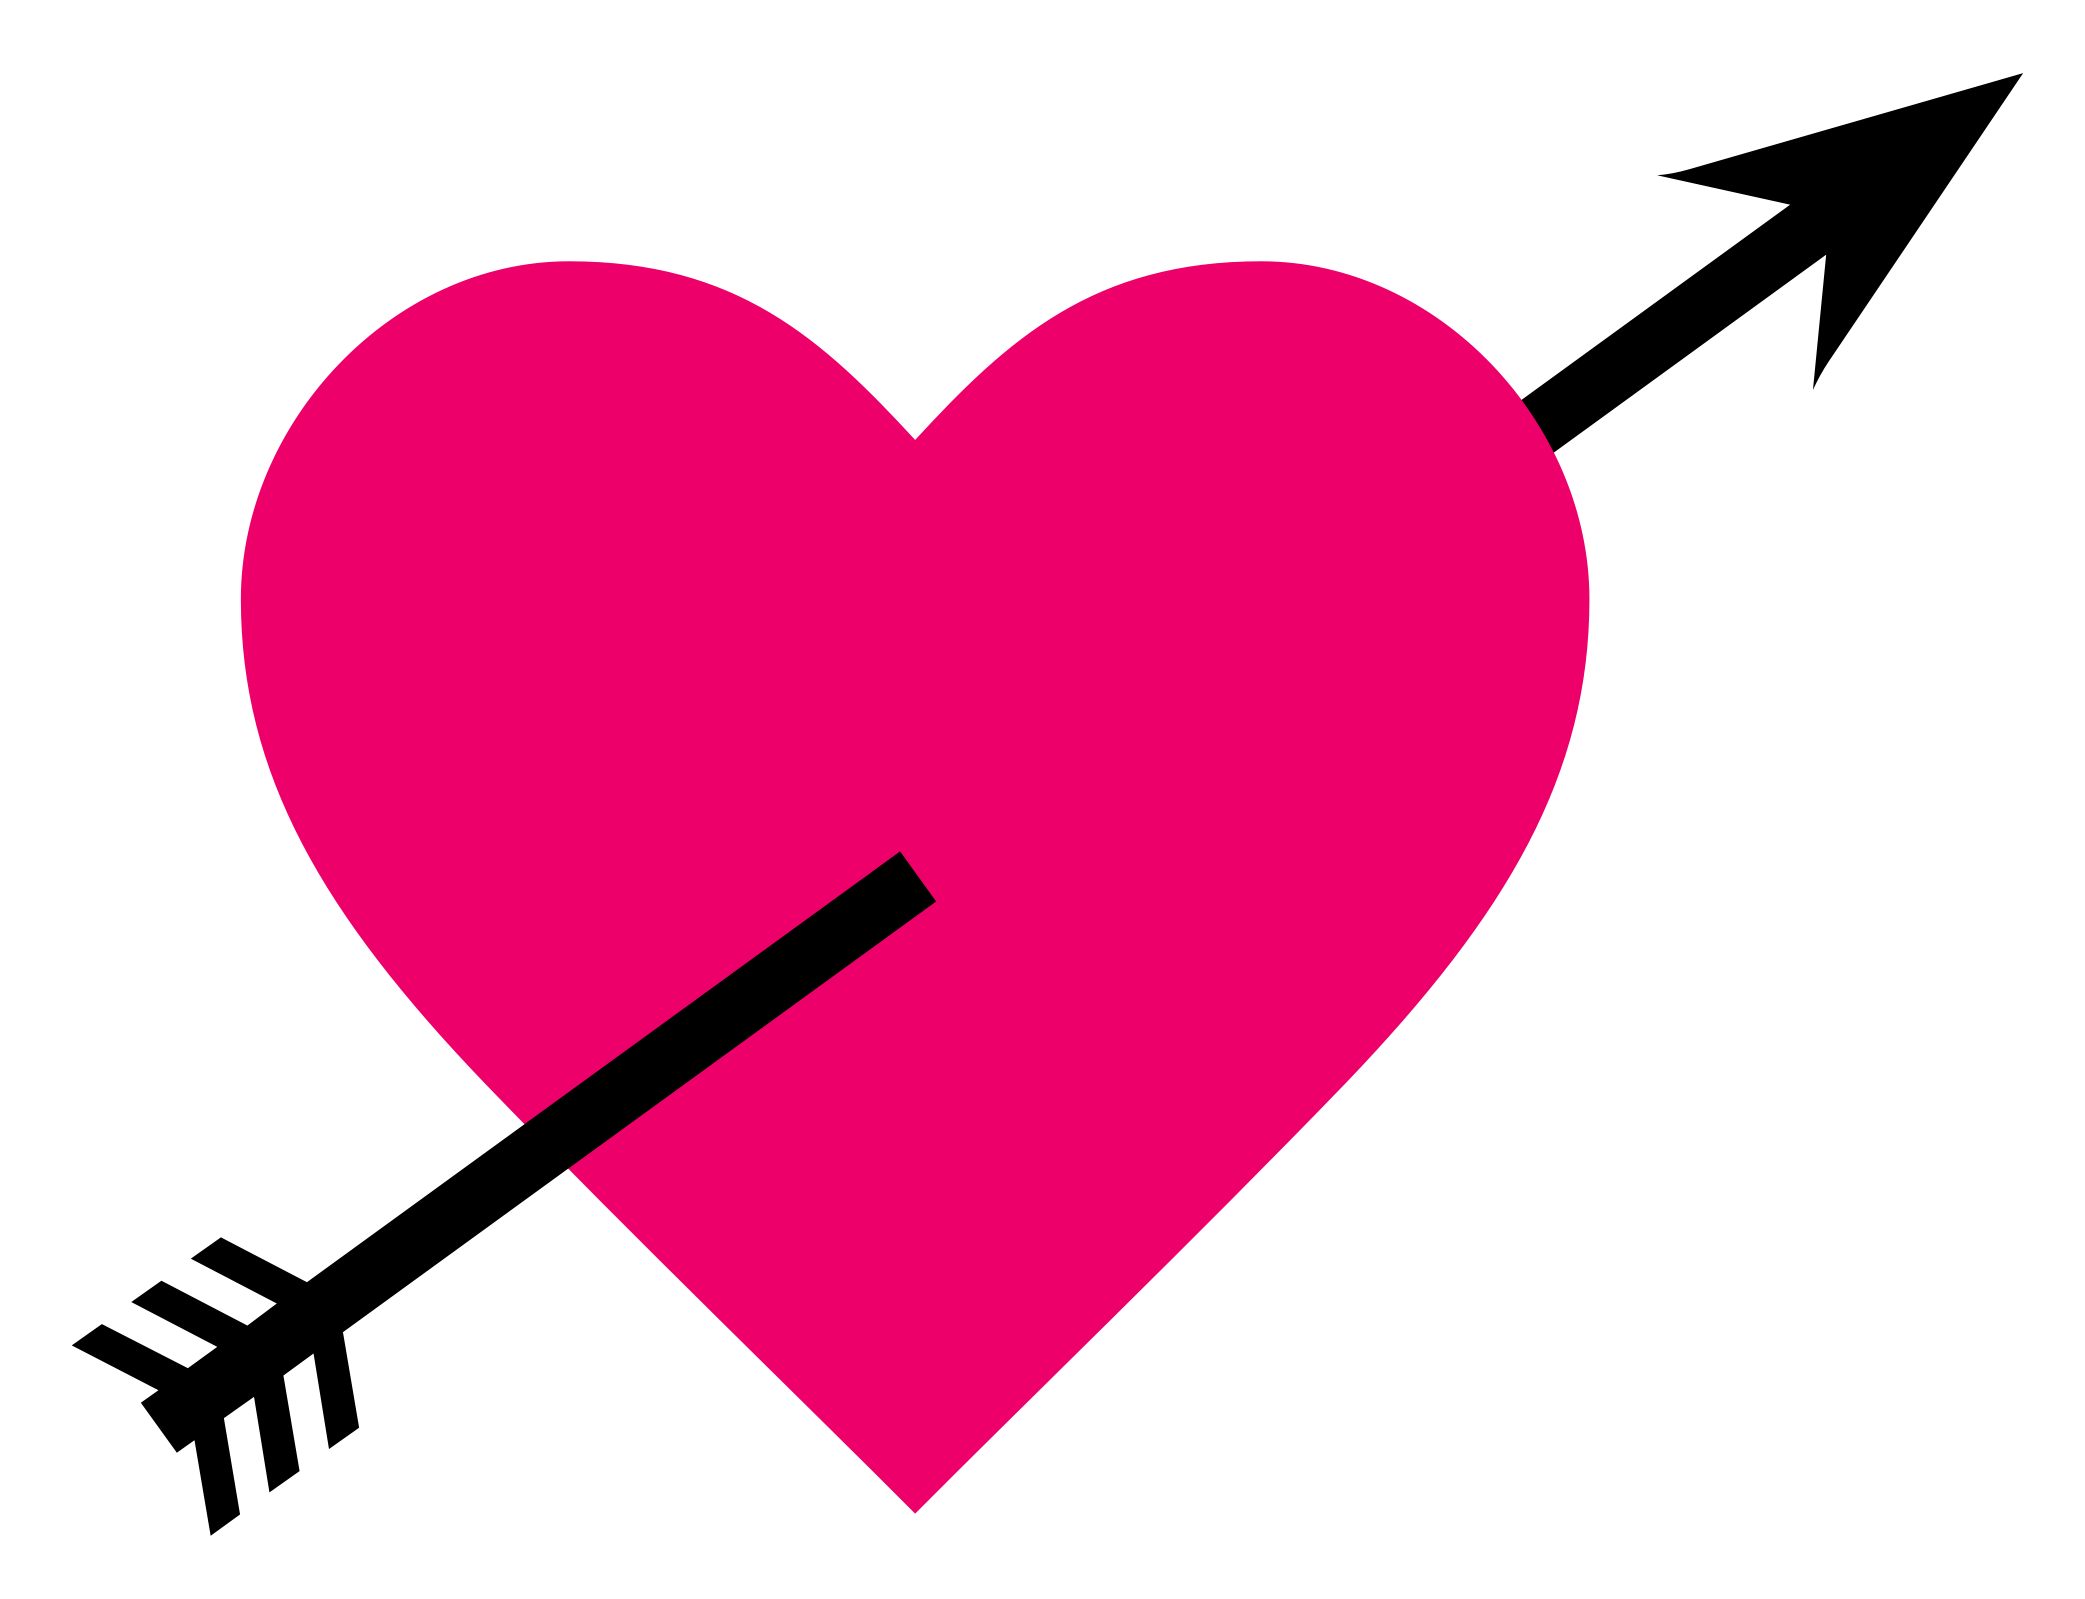 Heart Png Transparent Image - Heart, Transparent background PNG HD thumbnail